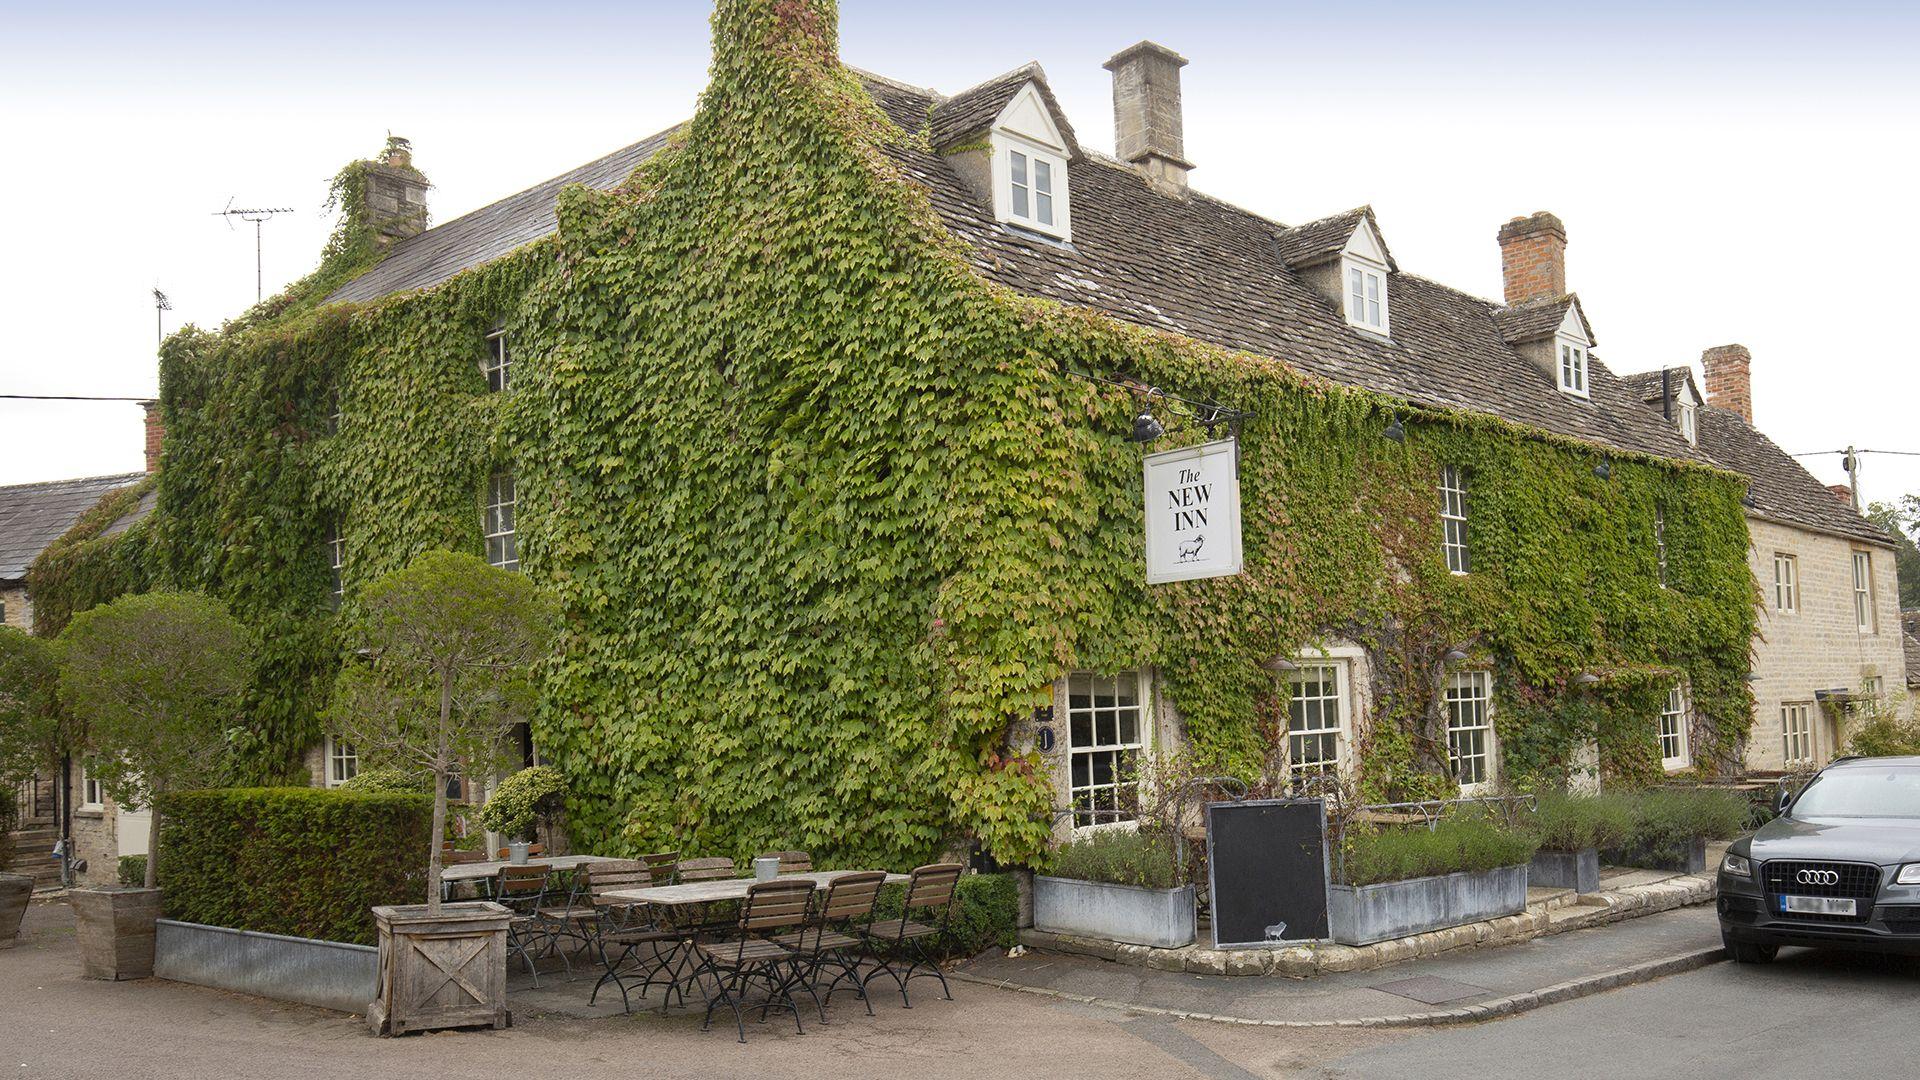 Nearby pub, The New Inn, Coln St Aldwyns,  Meadow View 2, Bolthole Retreats